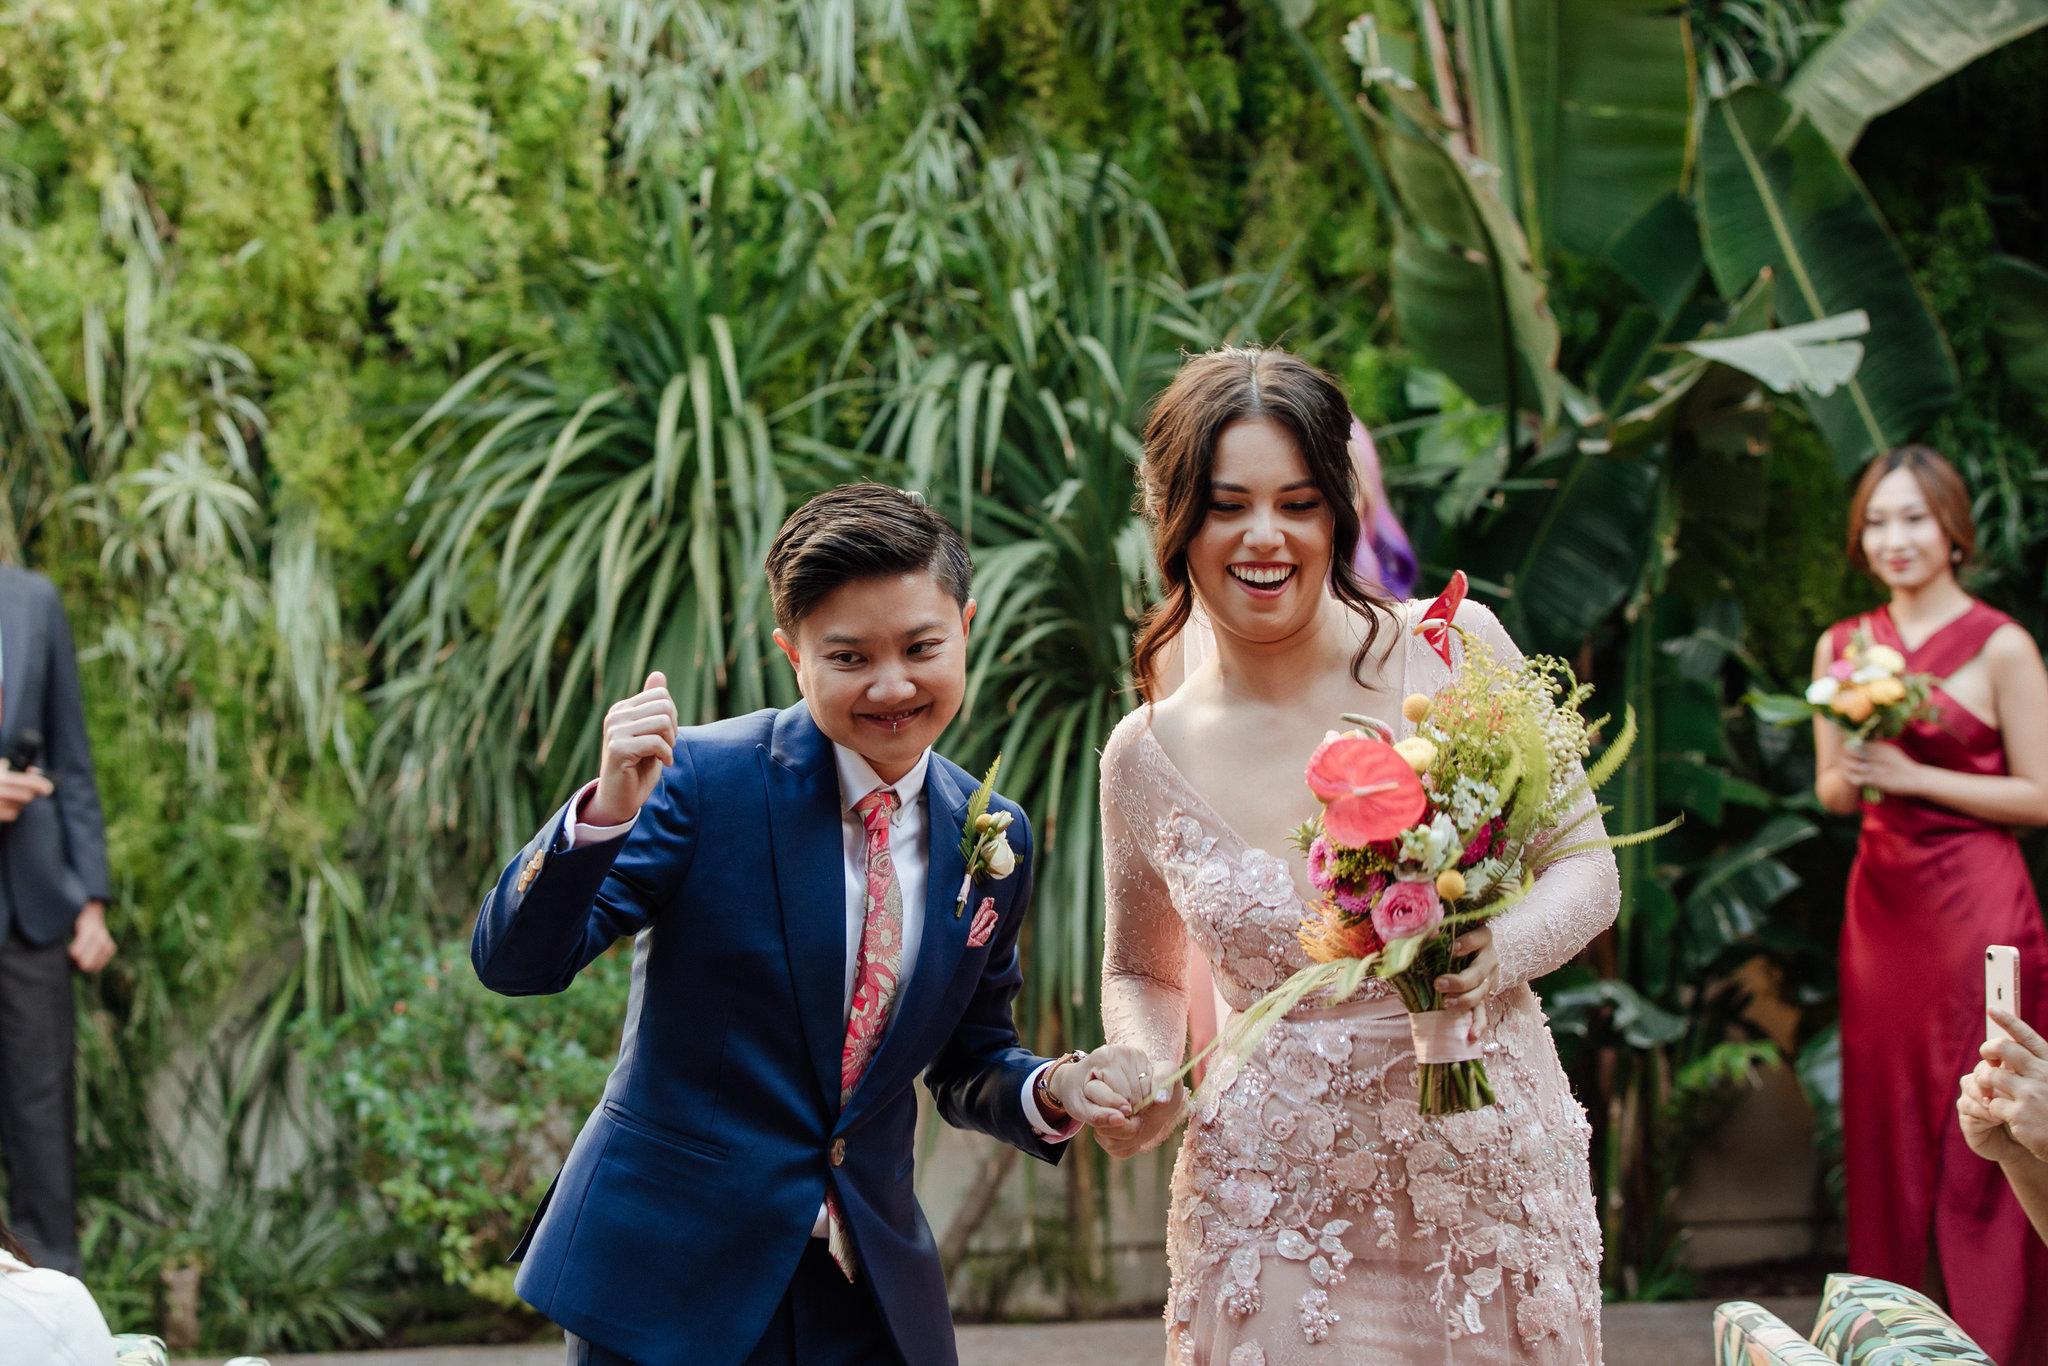 millwick-wedding-marble-rye-photography-030118-ceremony-108.jpg